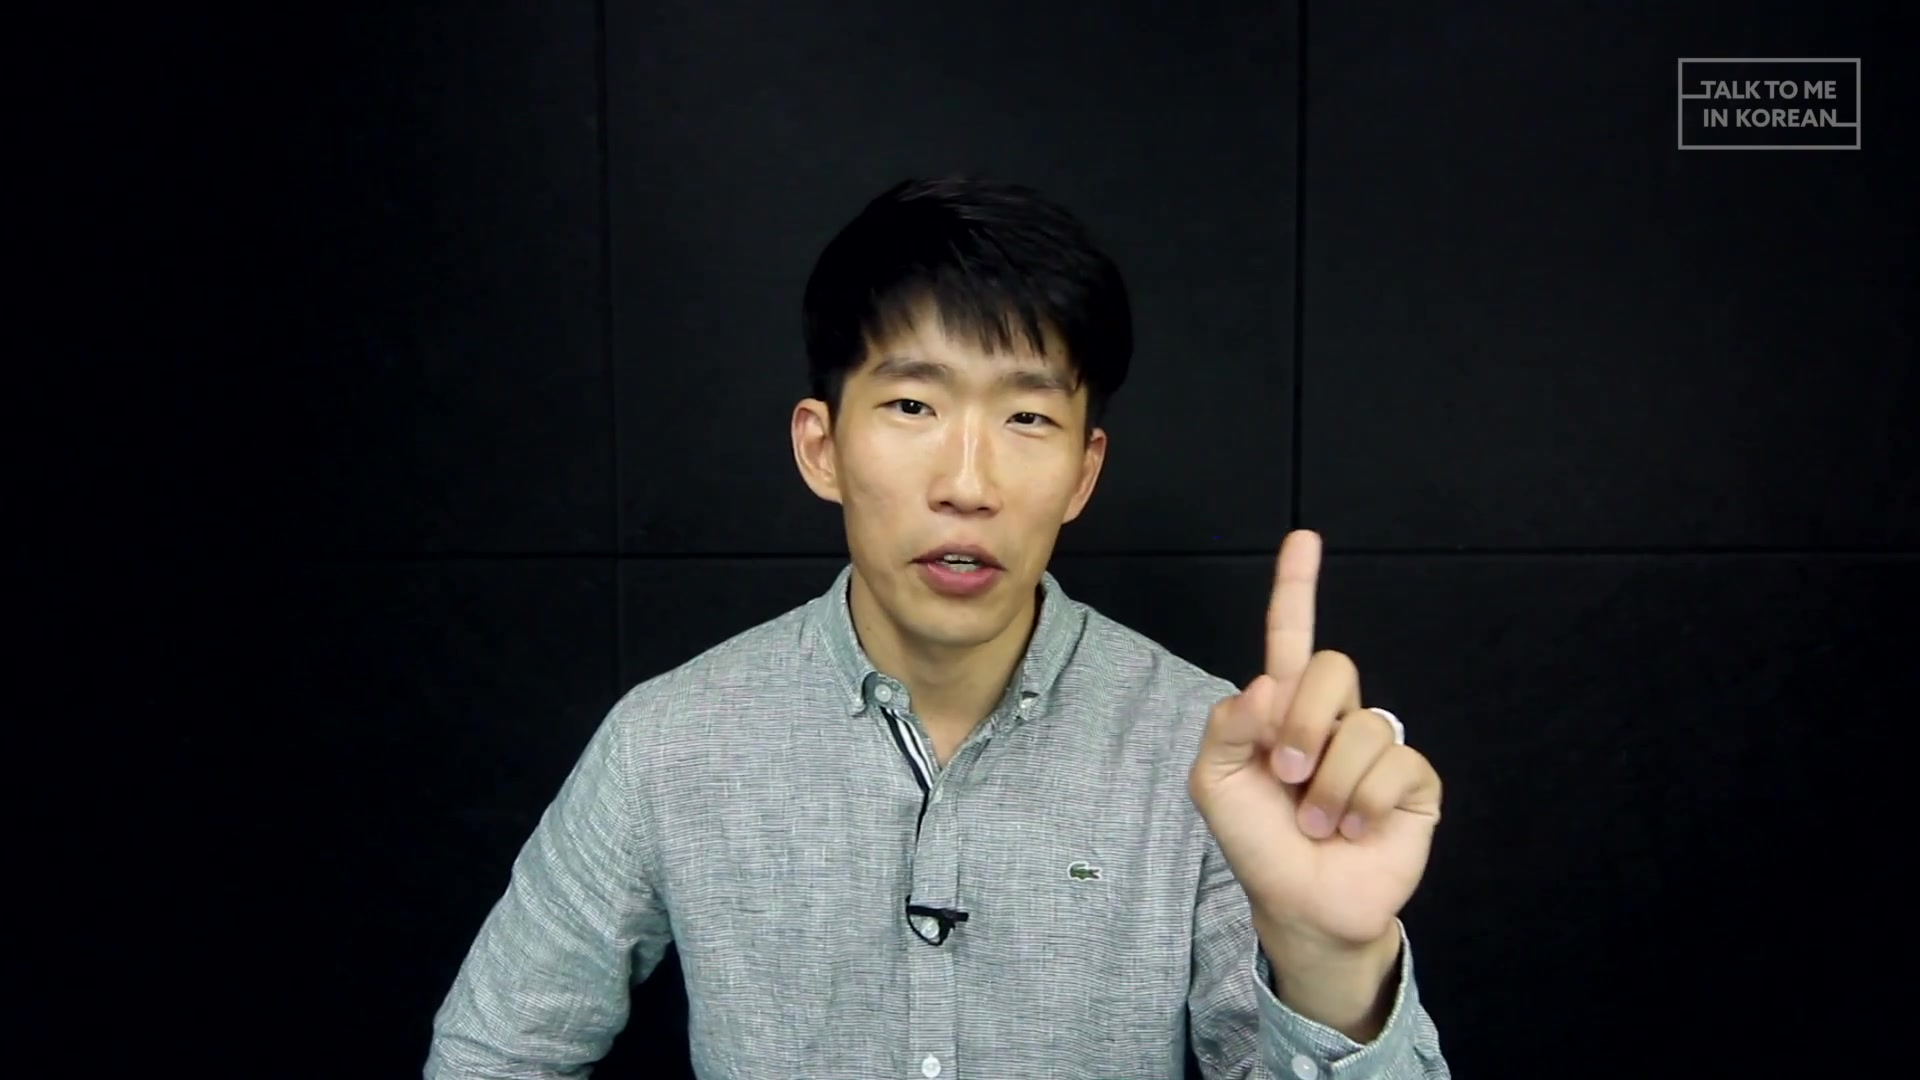 TalkToMeInKorean Episode 169: Culture Talk: Eating Alone vs. Together in Korea